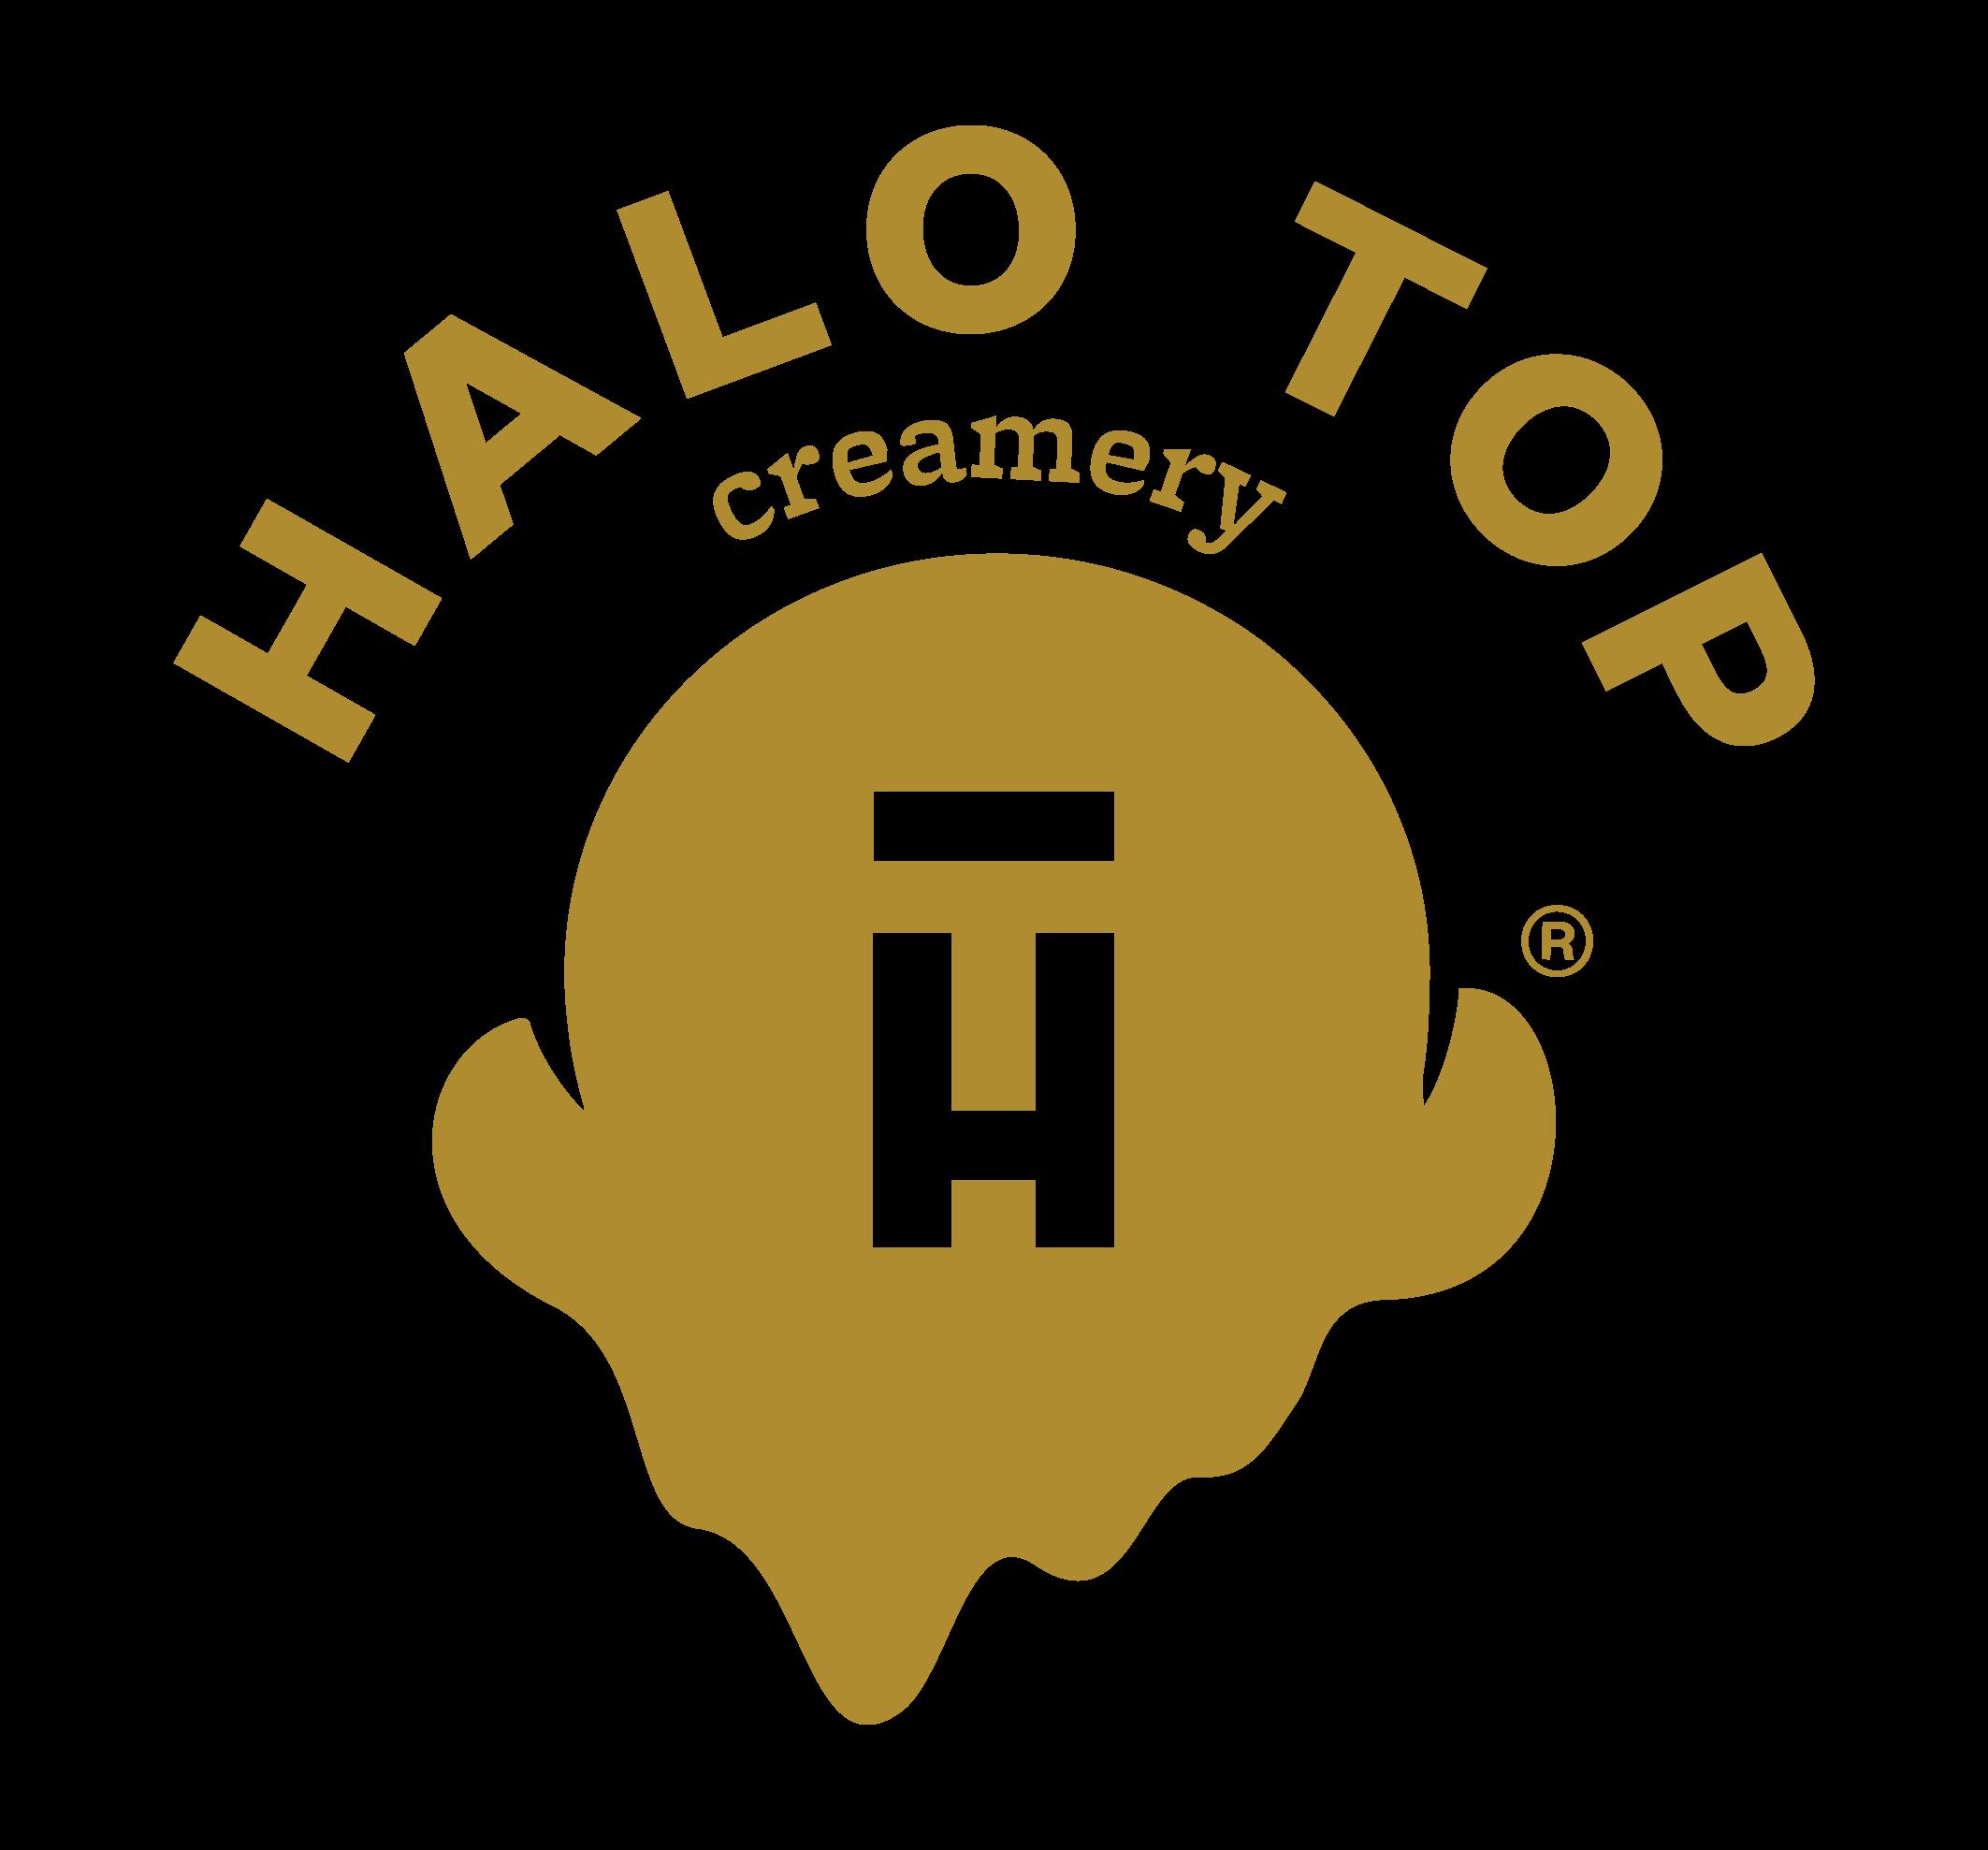 HT18_HT_AUS_Logo_full_041619.png